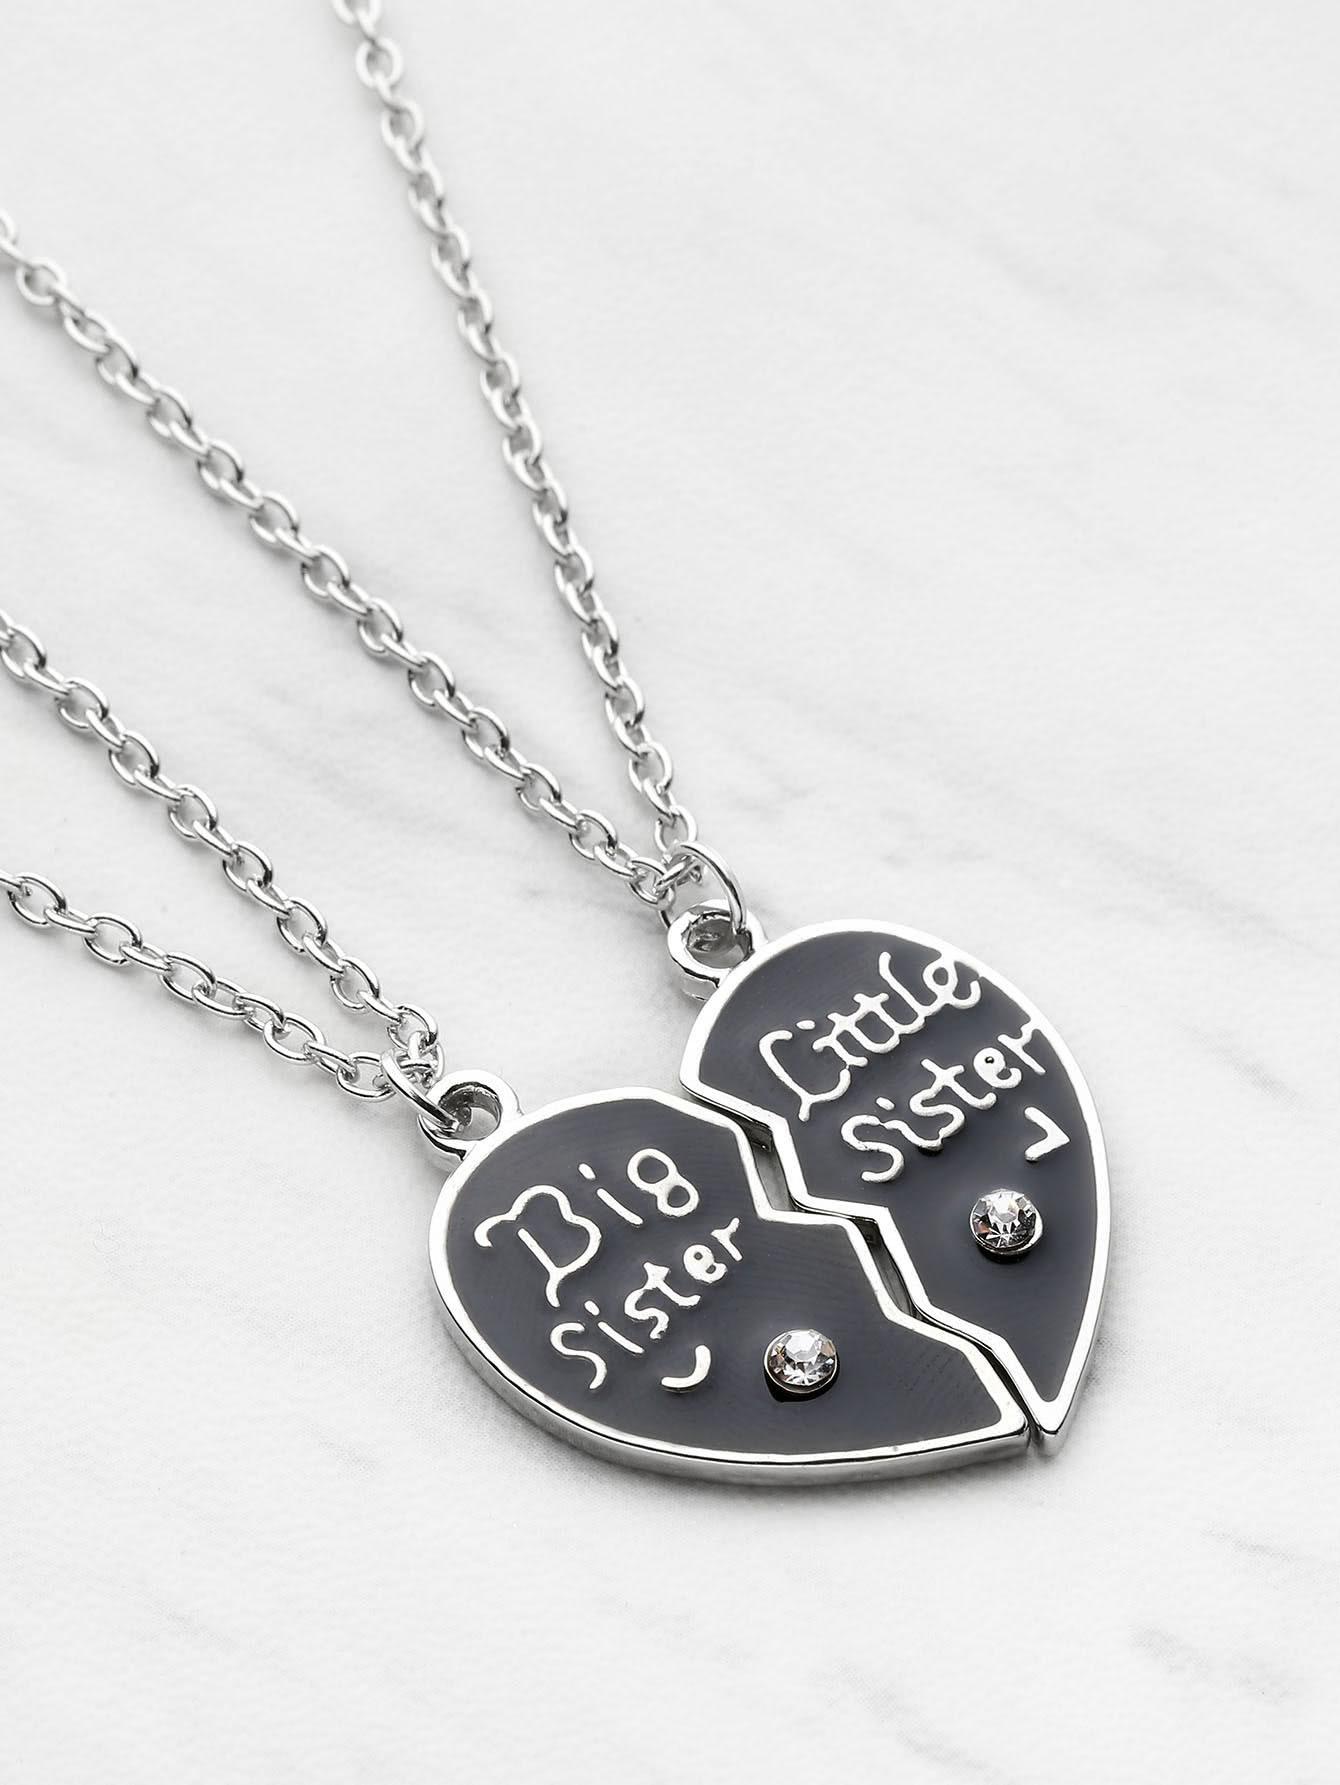 Heart Shaped Friendship Necklace 2pcs